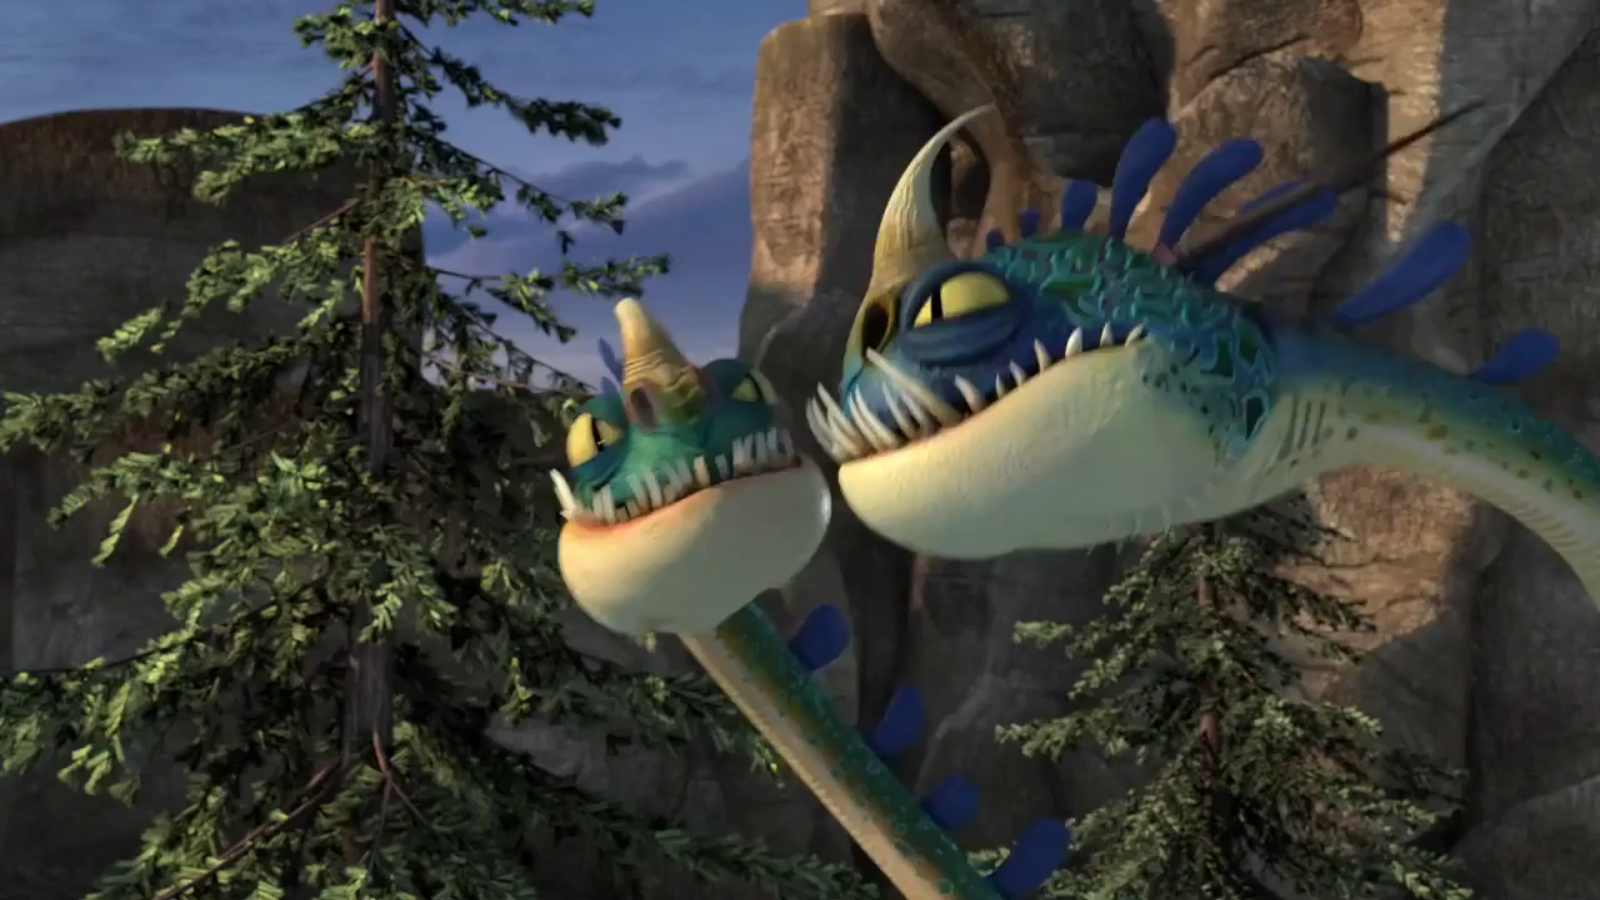 Image 2 heads of a wild zipplebackg how to train your dragon 2 heads of a wild zipplebackg ccuart Choice Image